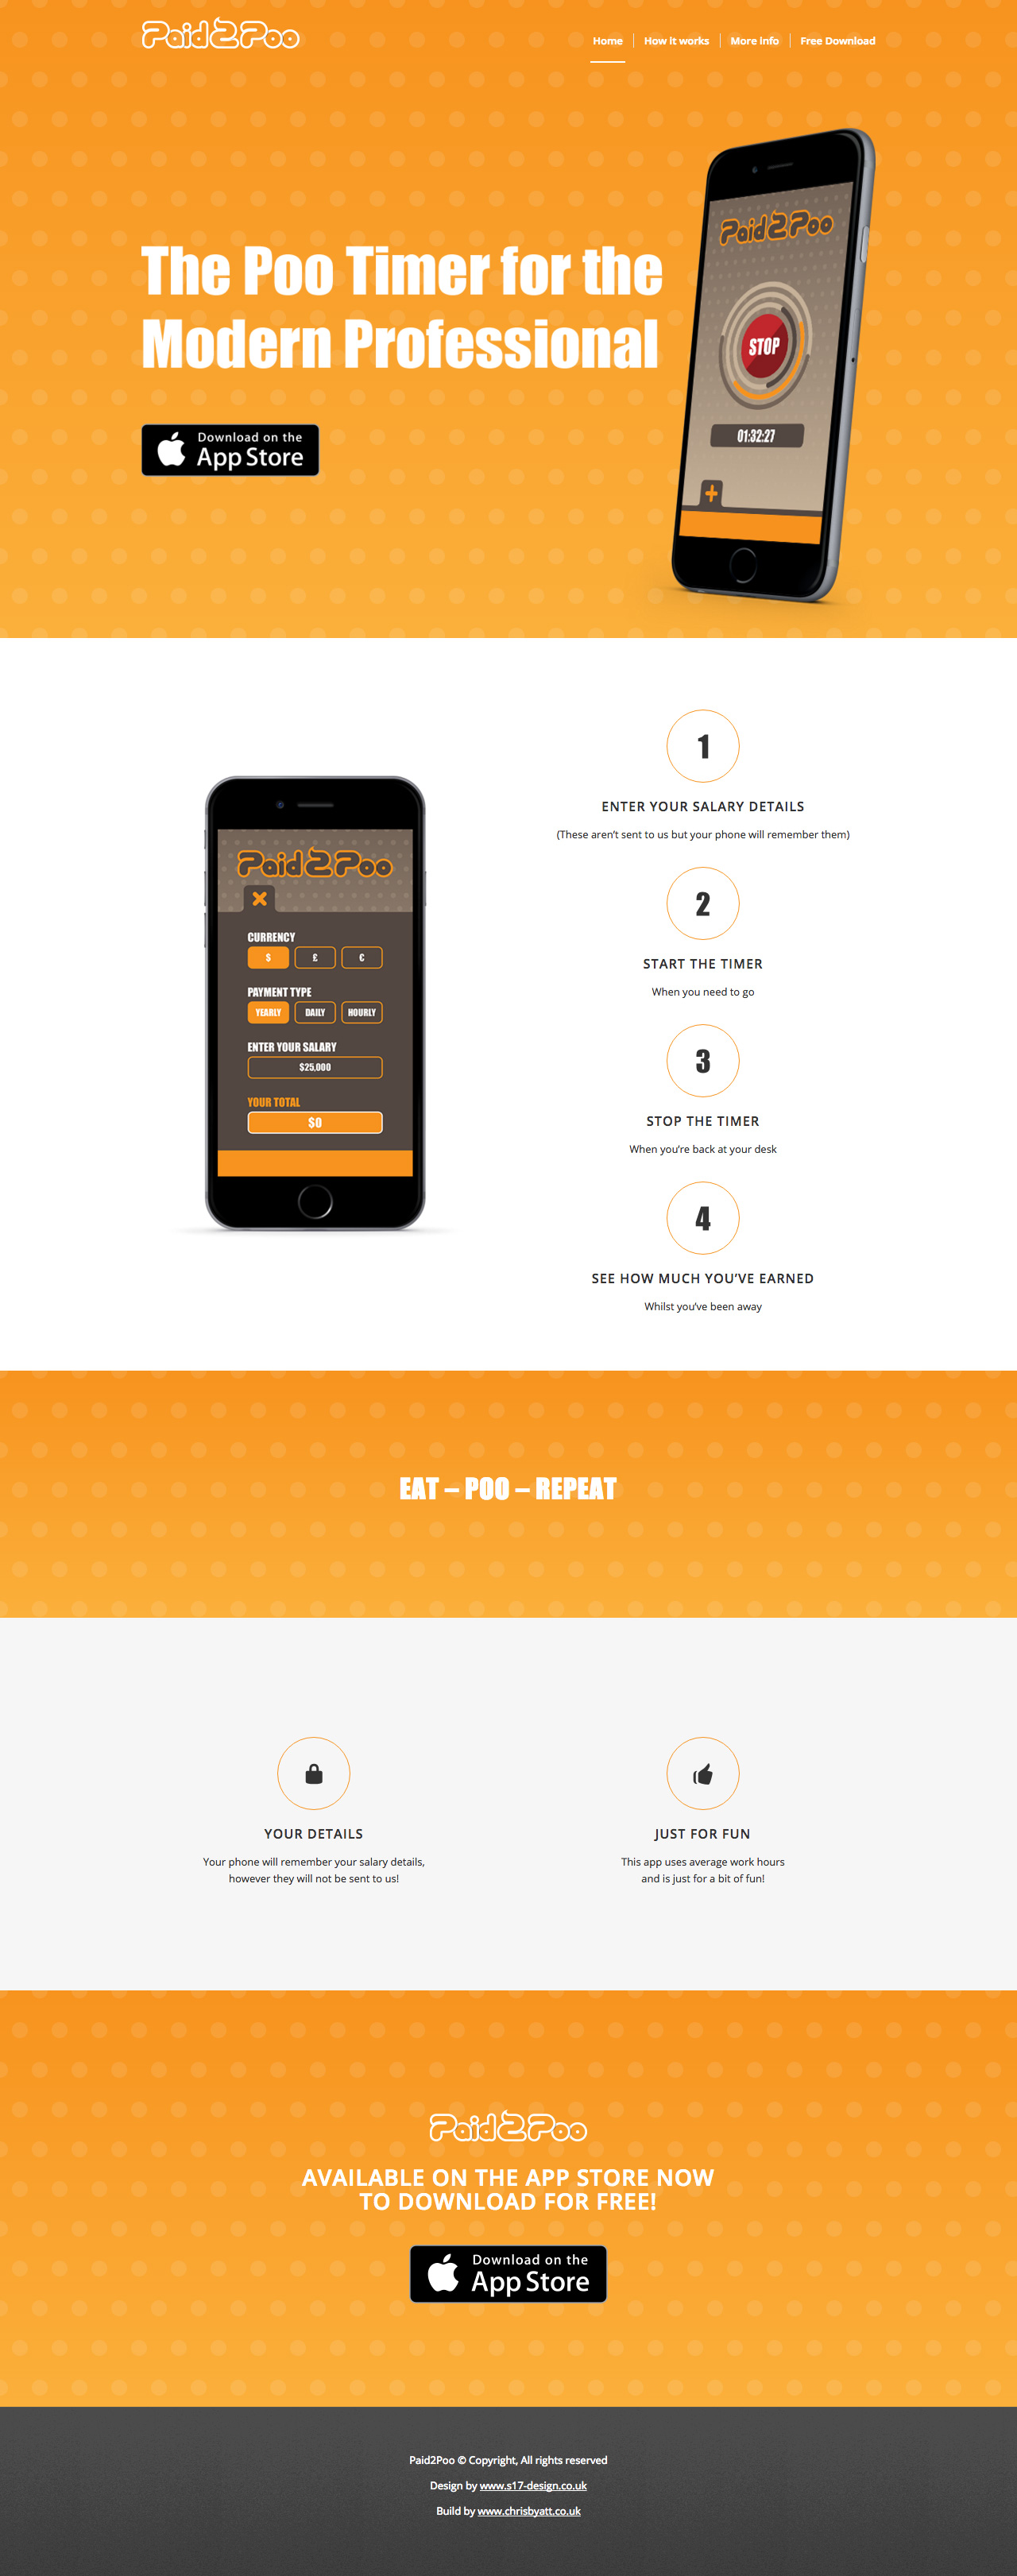 Paid2Poo Website Screenshot